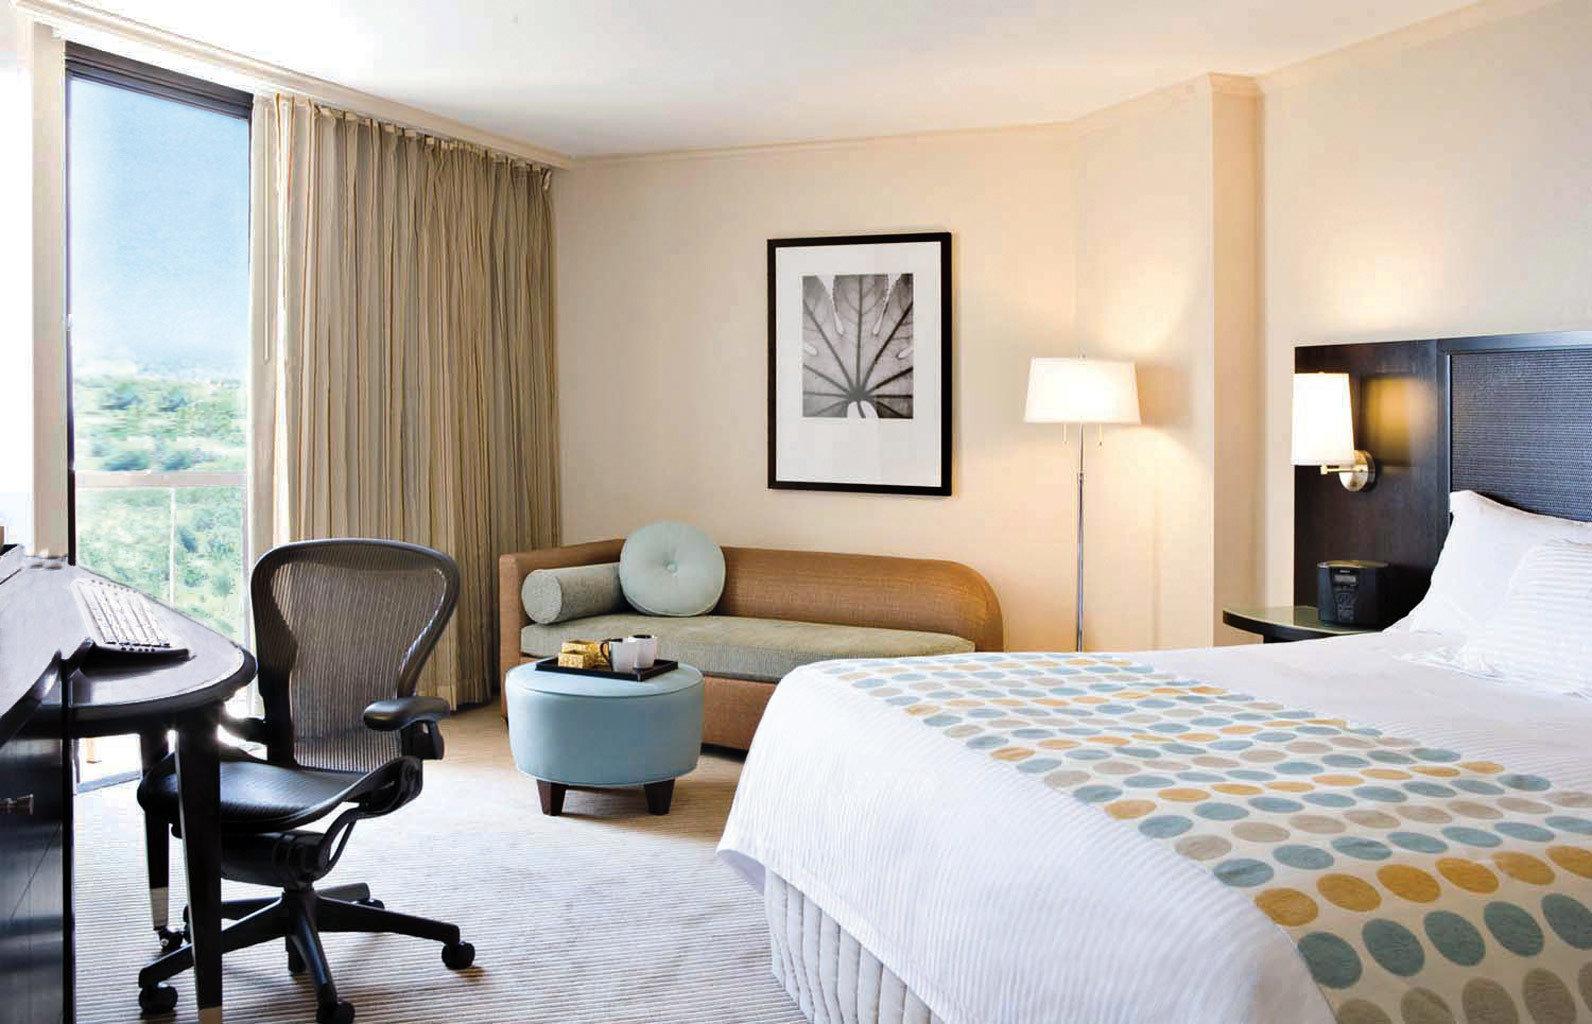 Bedroom Lounge Luxury Suite property chair condominium nice living room cottage